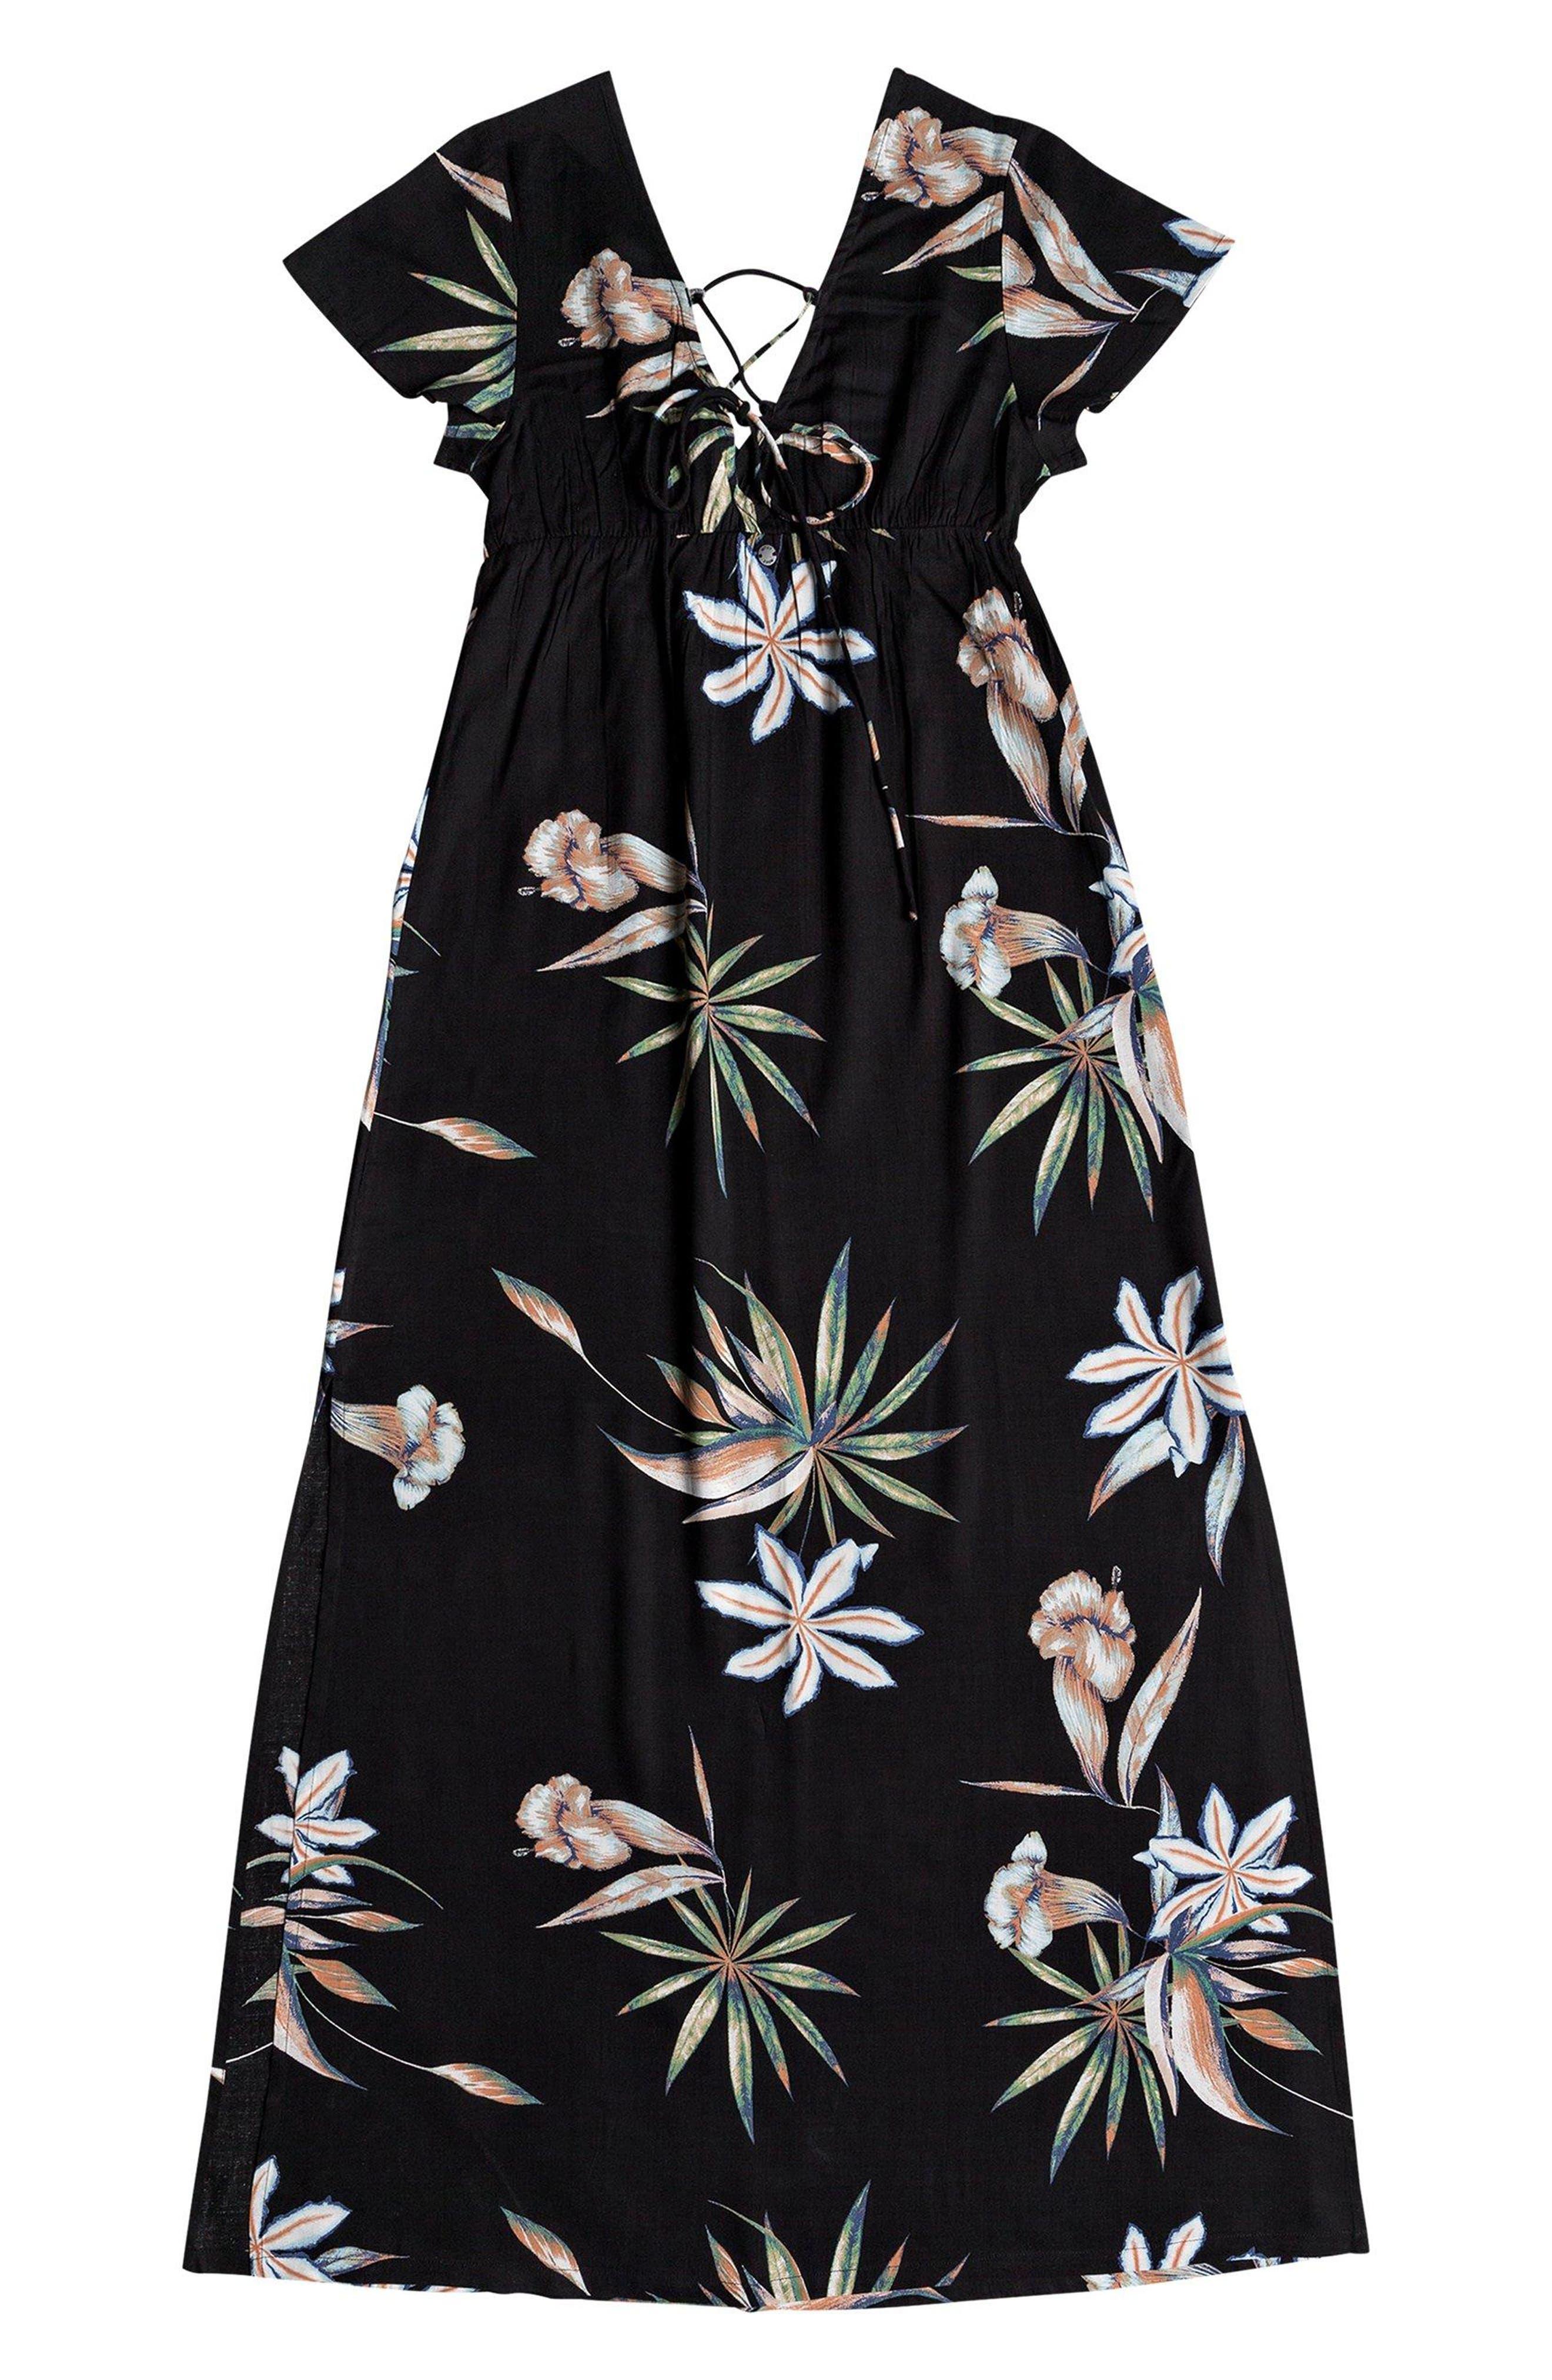 Lotus Heart Midi Dress,                             Alternate thumbnail 7, color,                             TRUE BLACK NIGHTLIGHTS